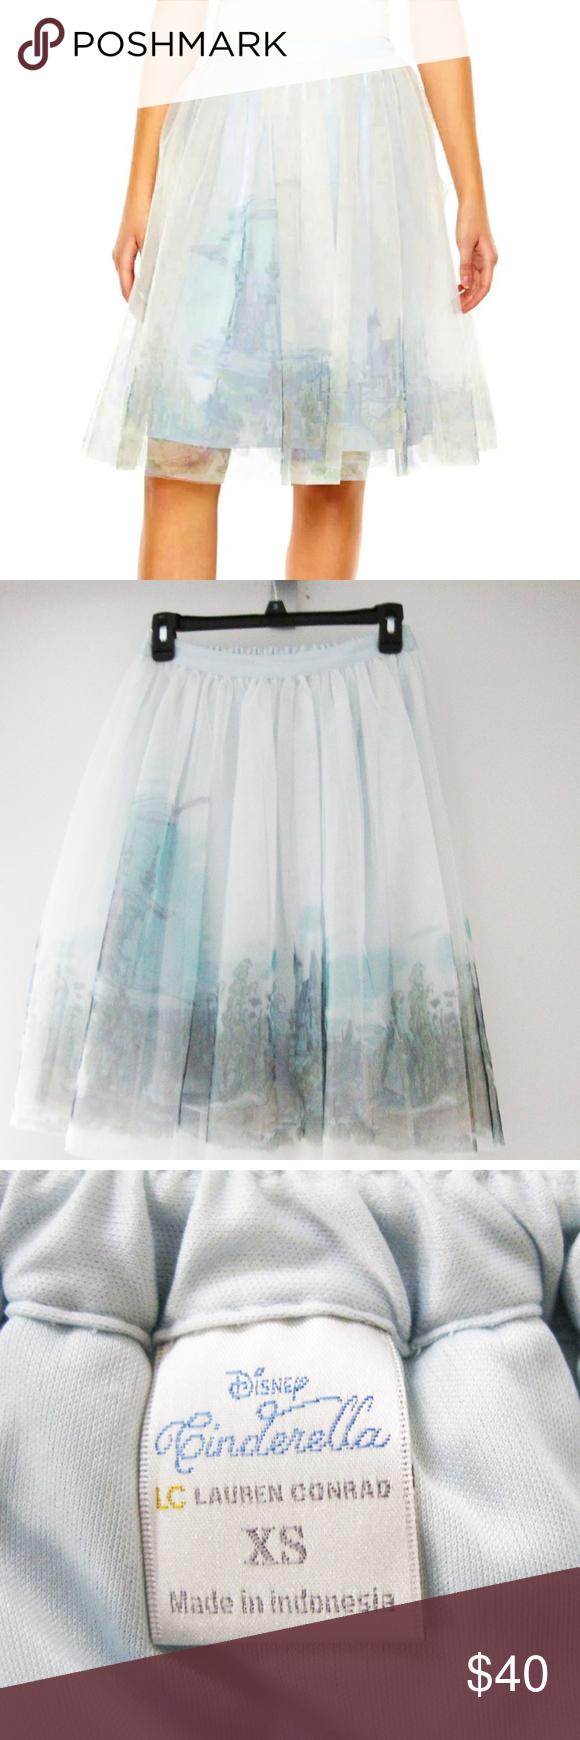 Disneys Cinderella by LC Conrad Tulle Skirt   Pretty